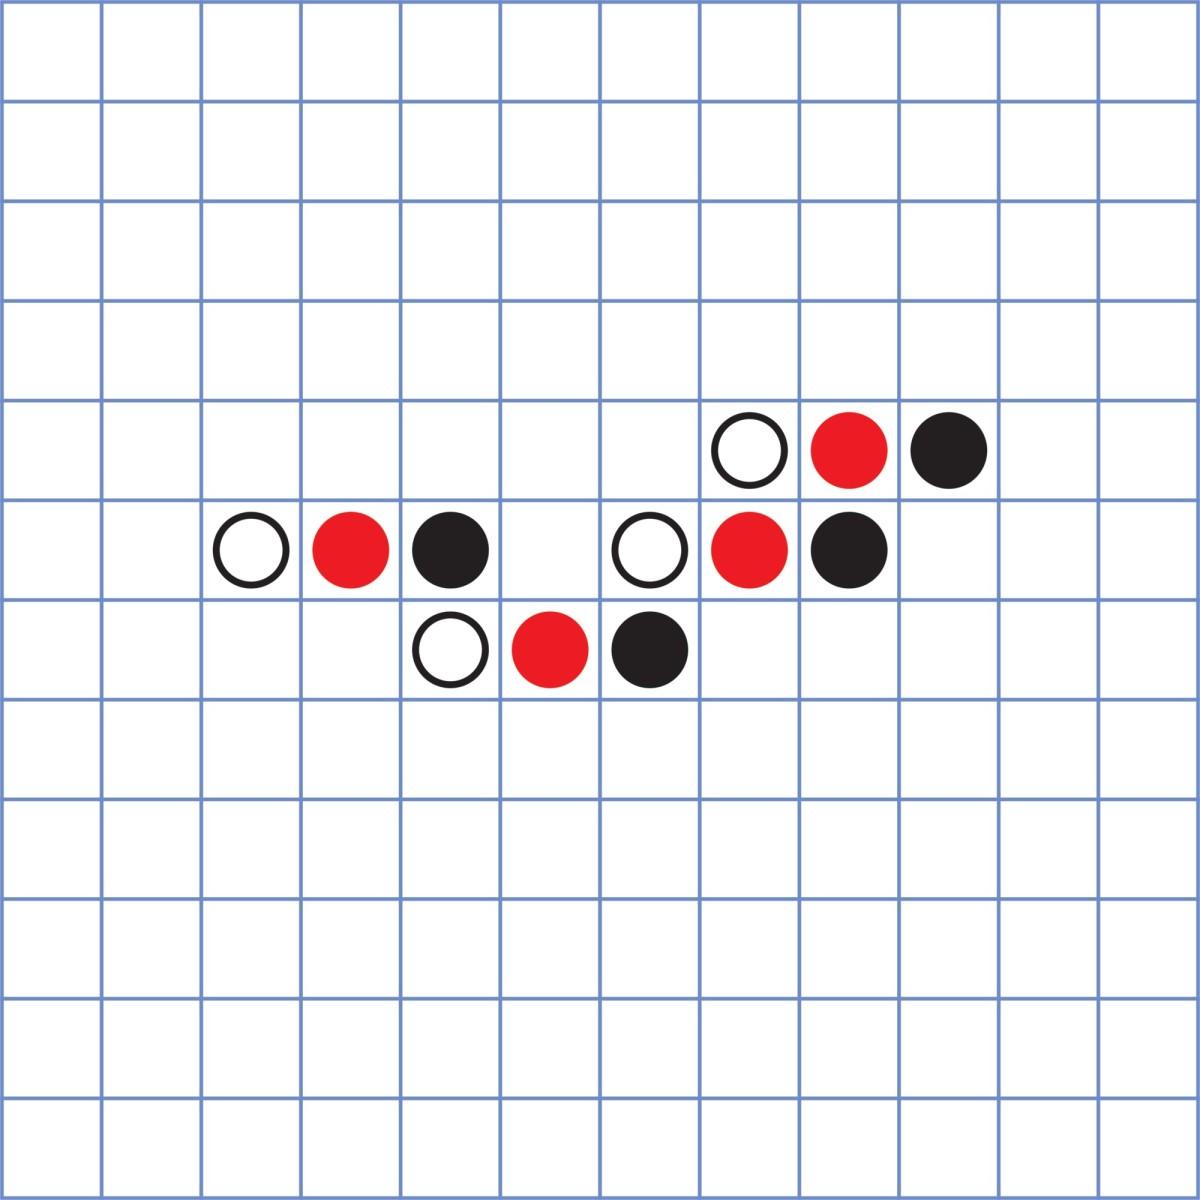 Figure 7: Challenge 1.